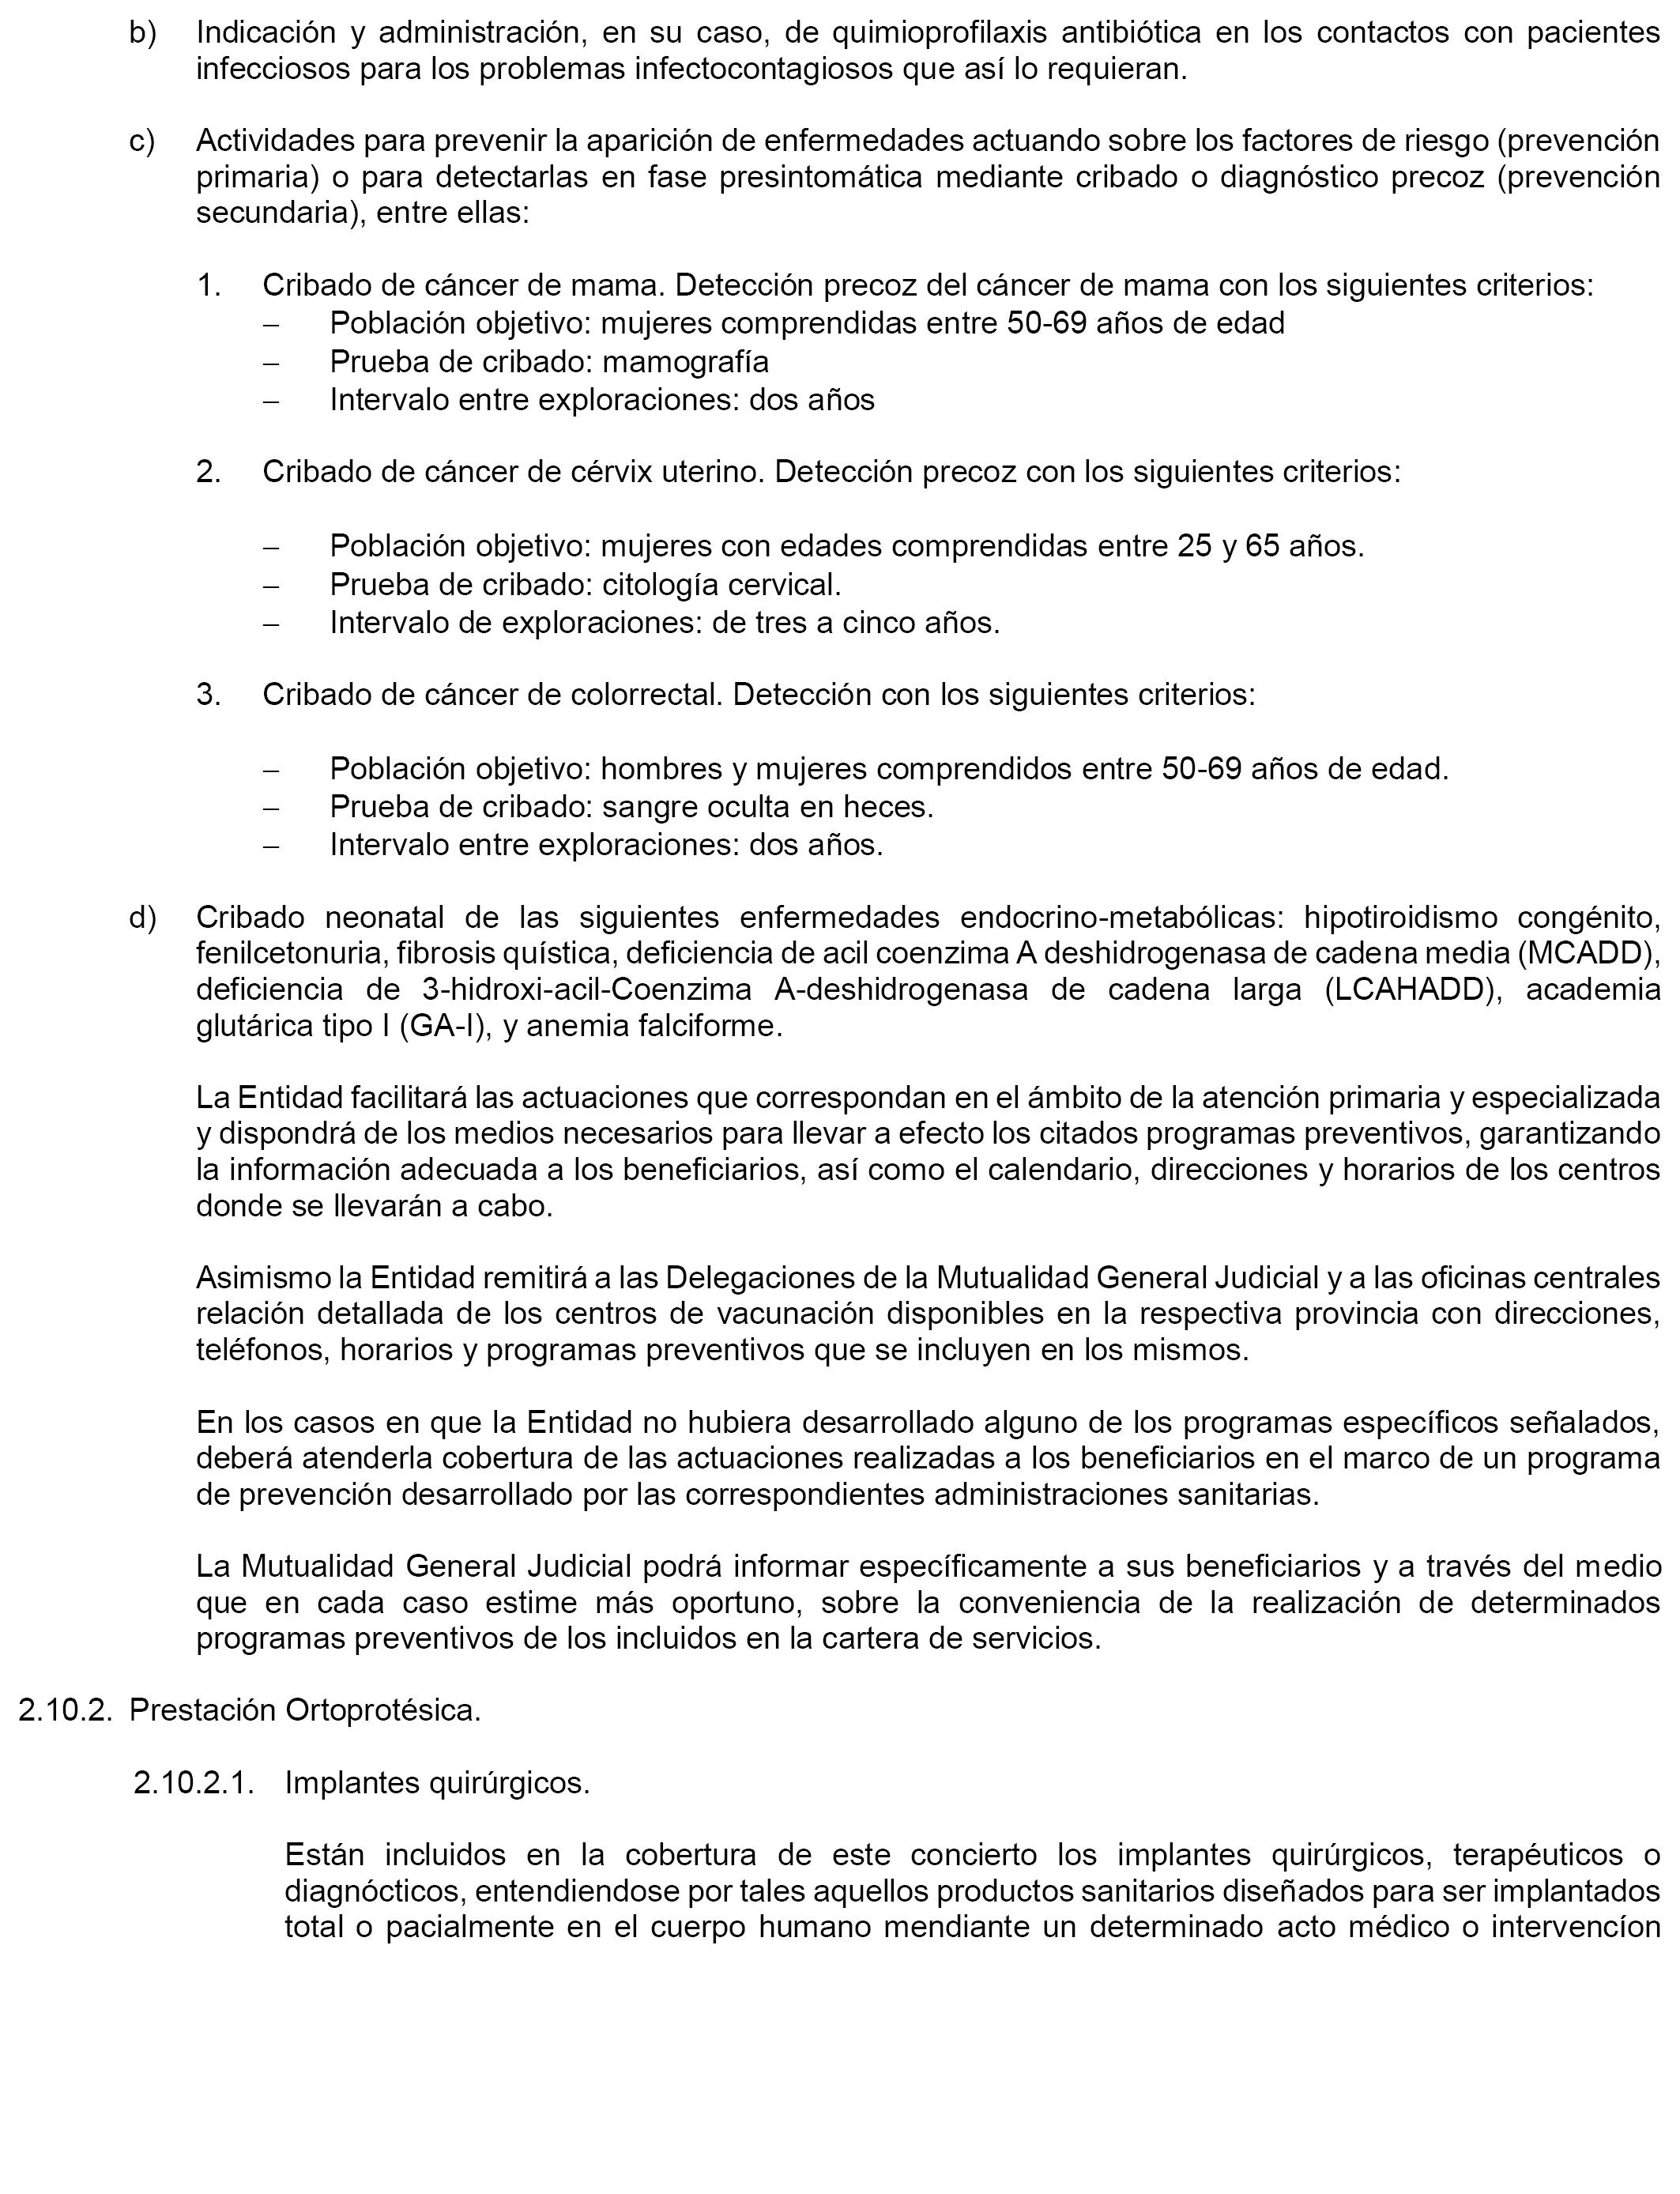 BOE.es - Documento BOE-A-2017-10591